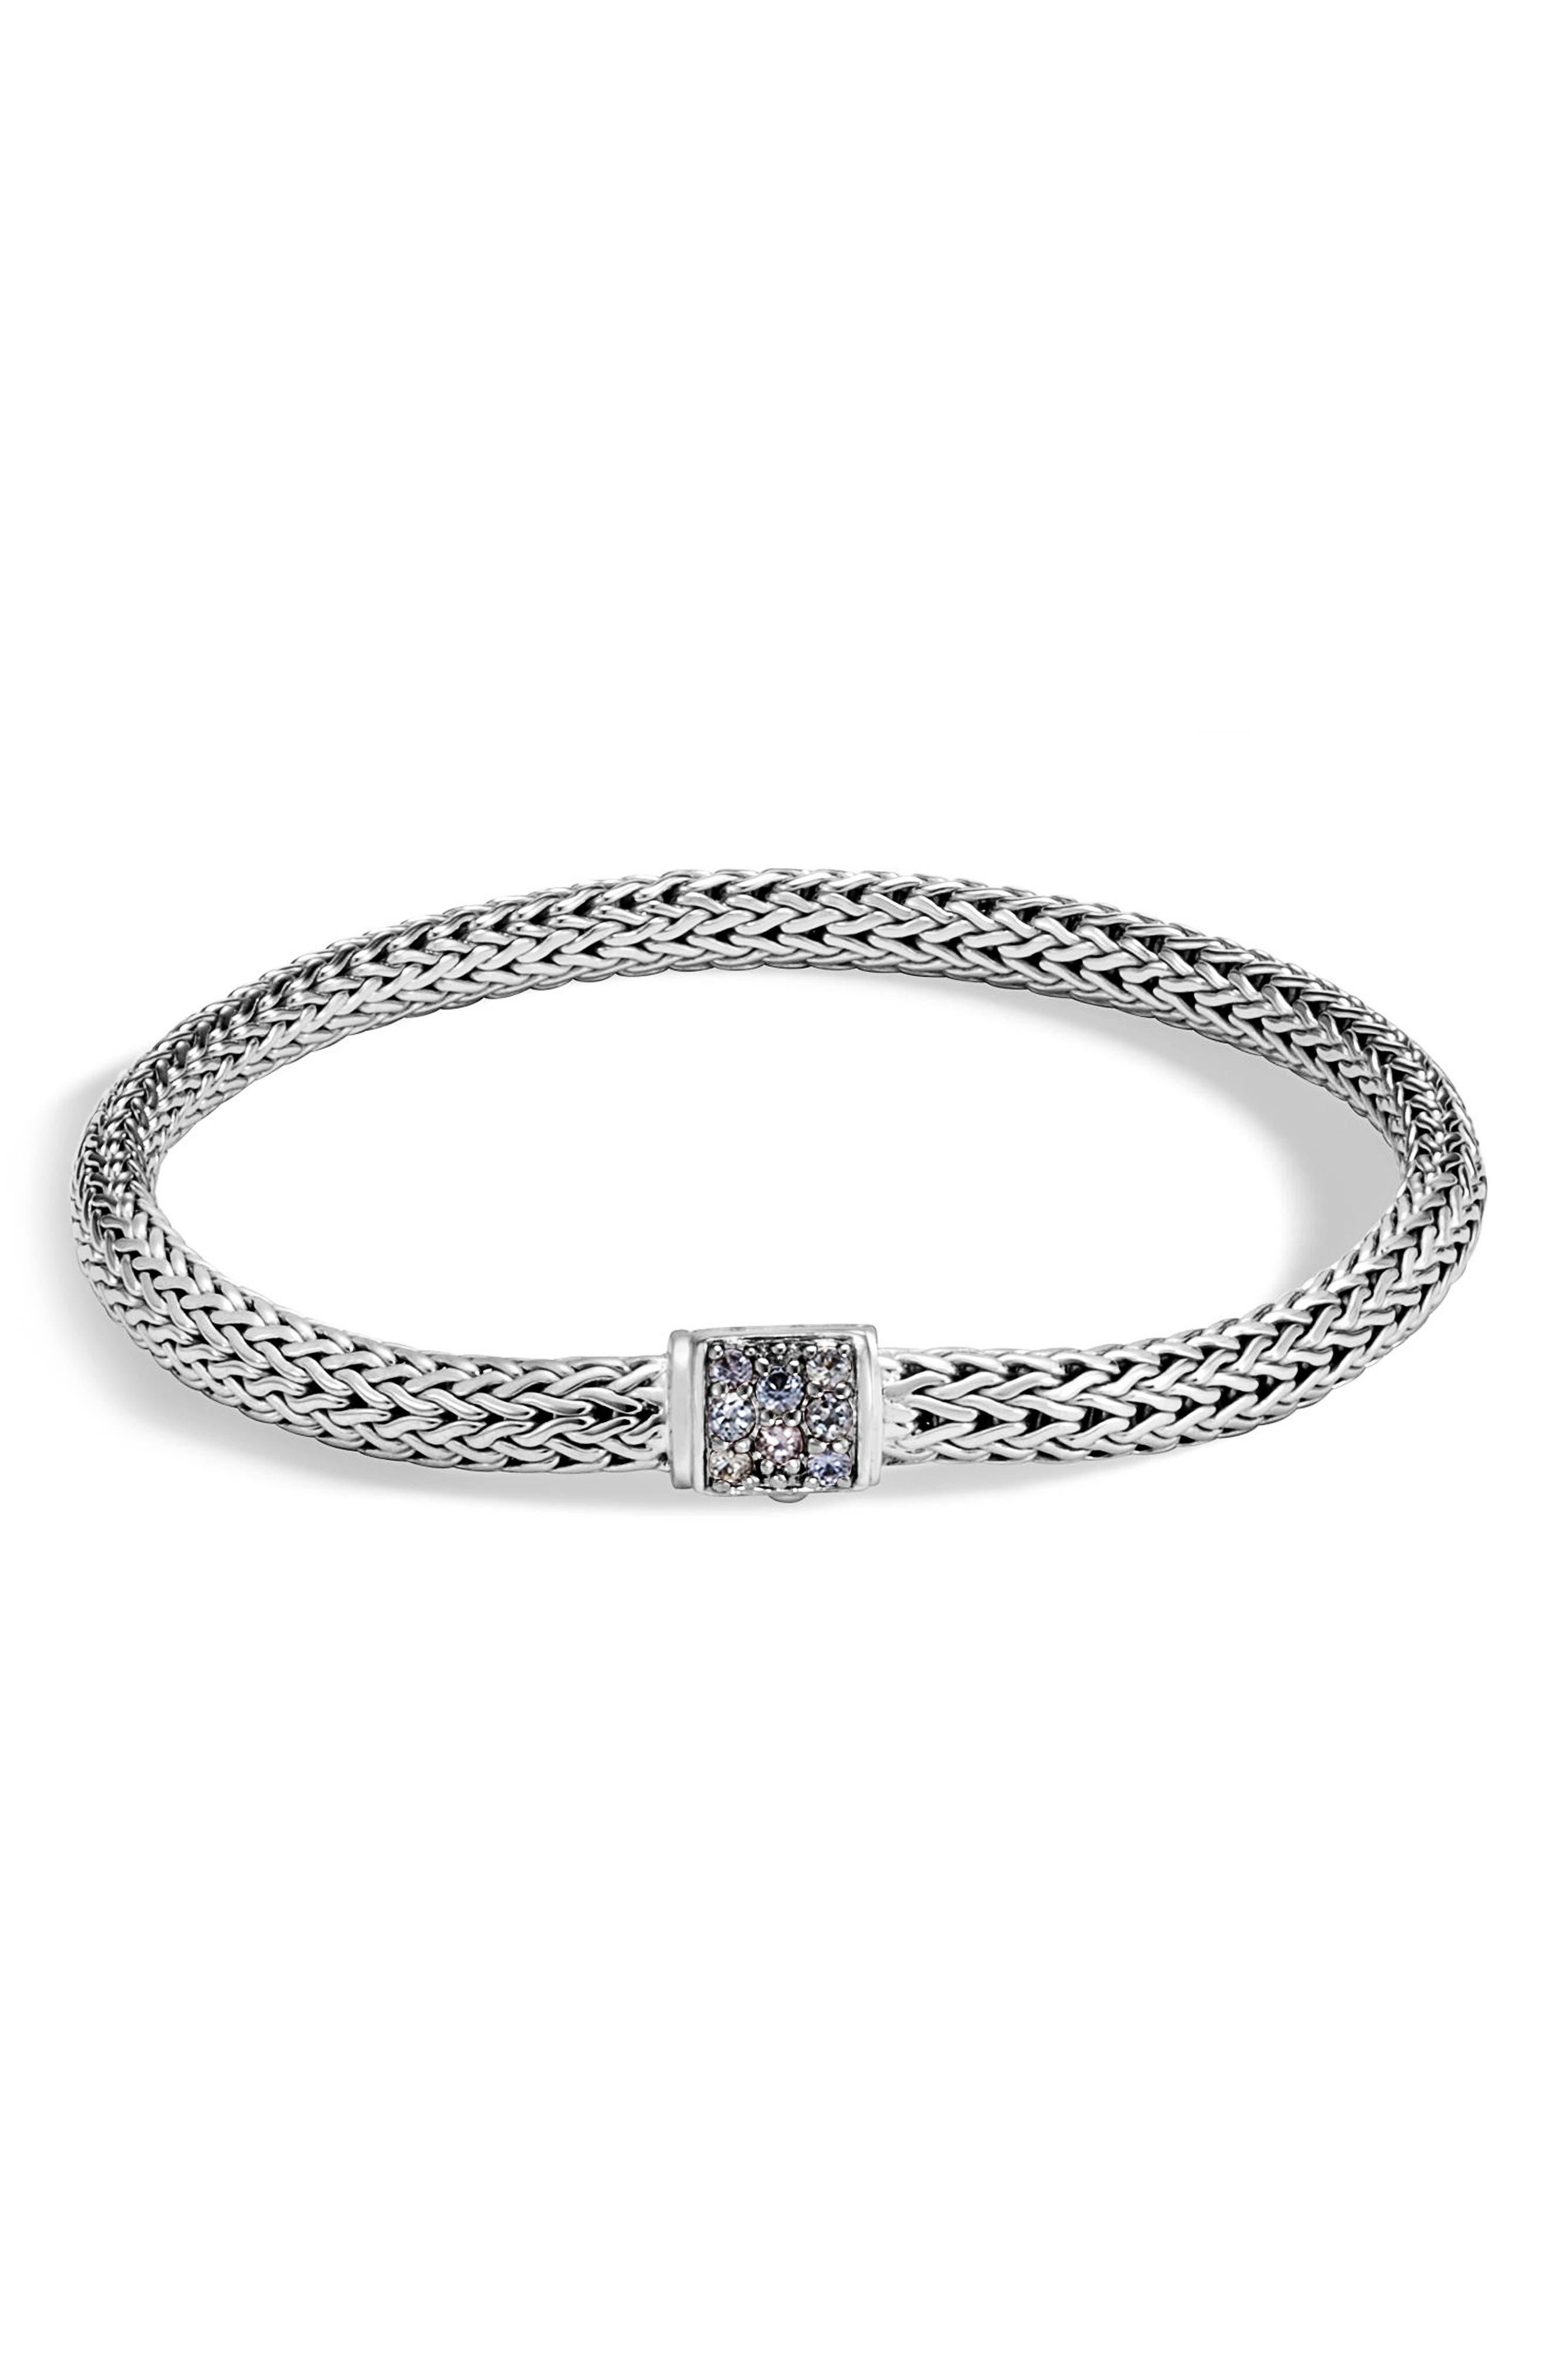 Alternate Image 1 Selected - John Hardy Classic Chain 5mm Bracelet